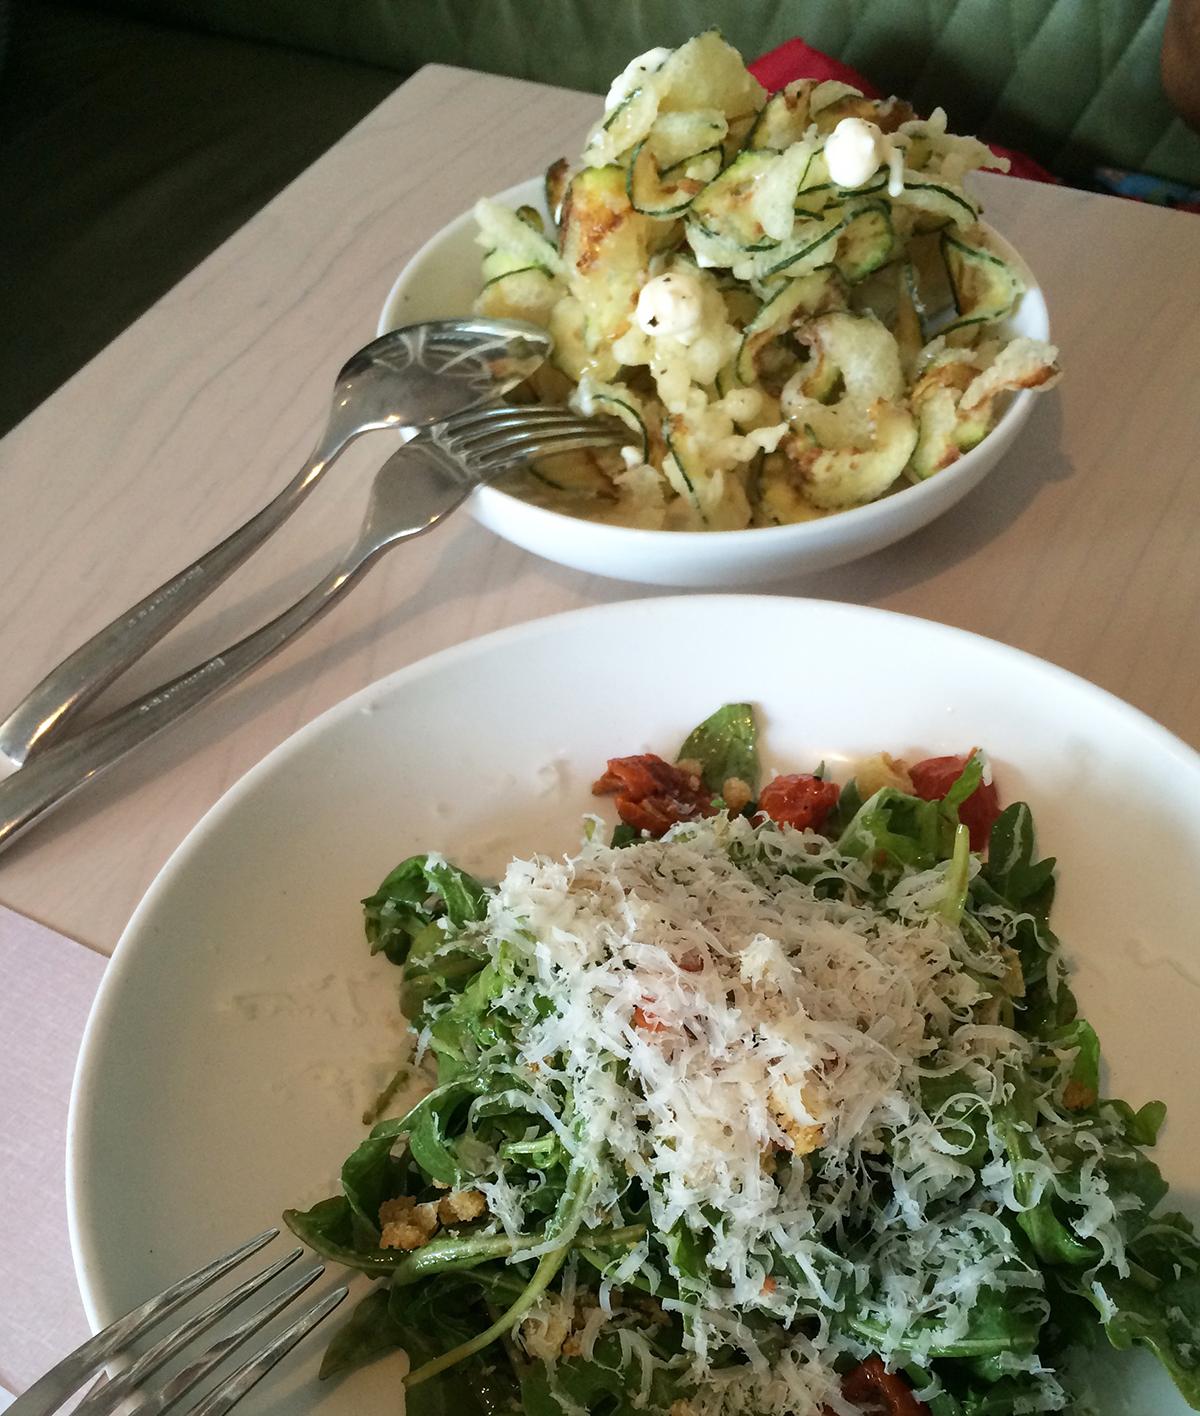 The Zucchini Fritti & Arugula Salad